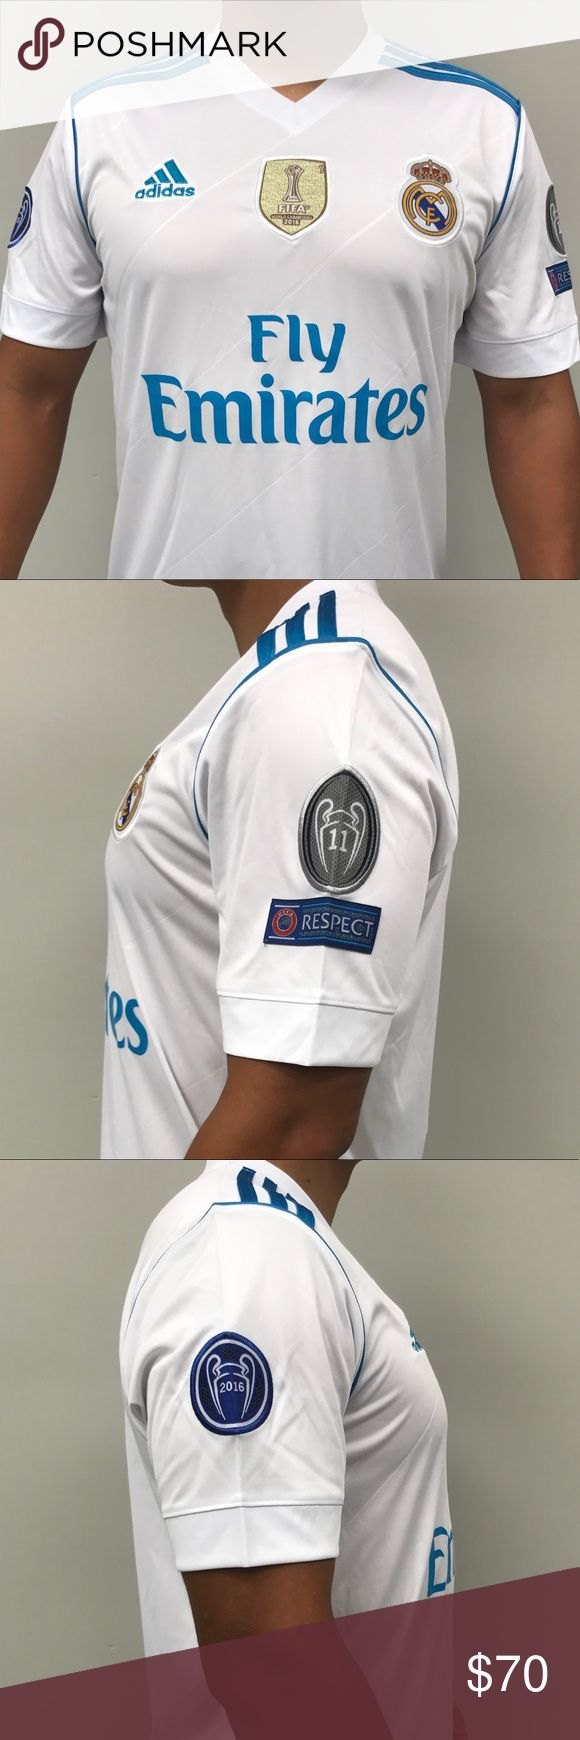 Real Madrid Home Jersey Cristiano Ronaldo #7 EU size (M) 2017-18 adidas Shirts